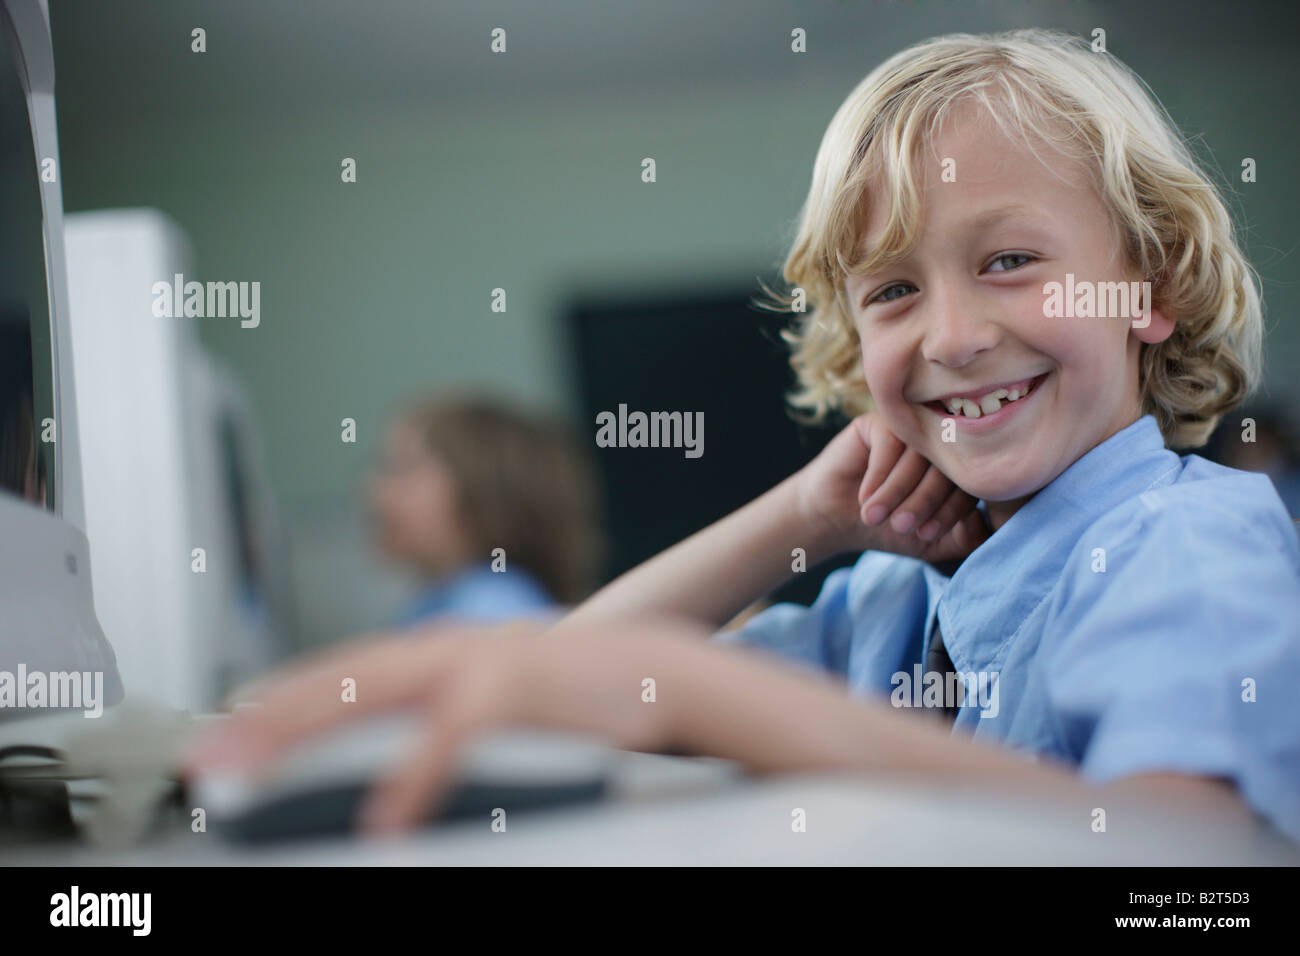 School boy at computer - Stock Image